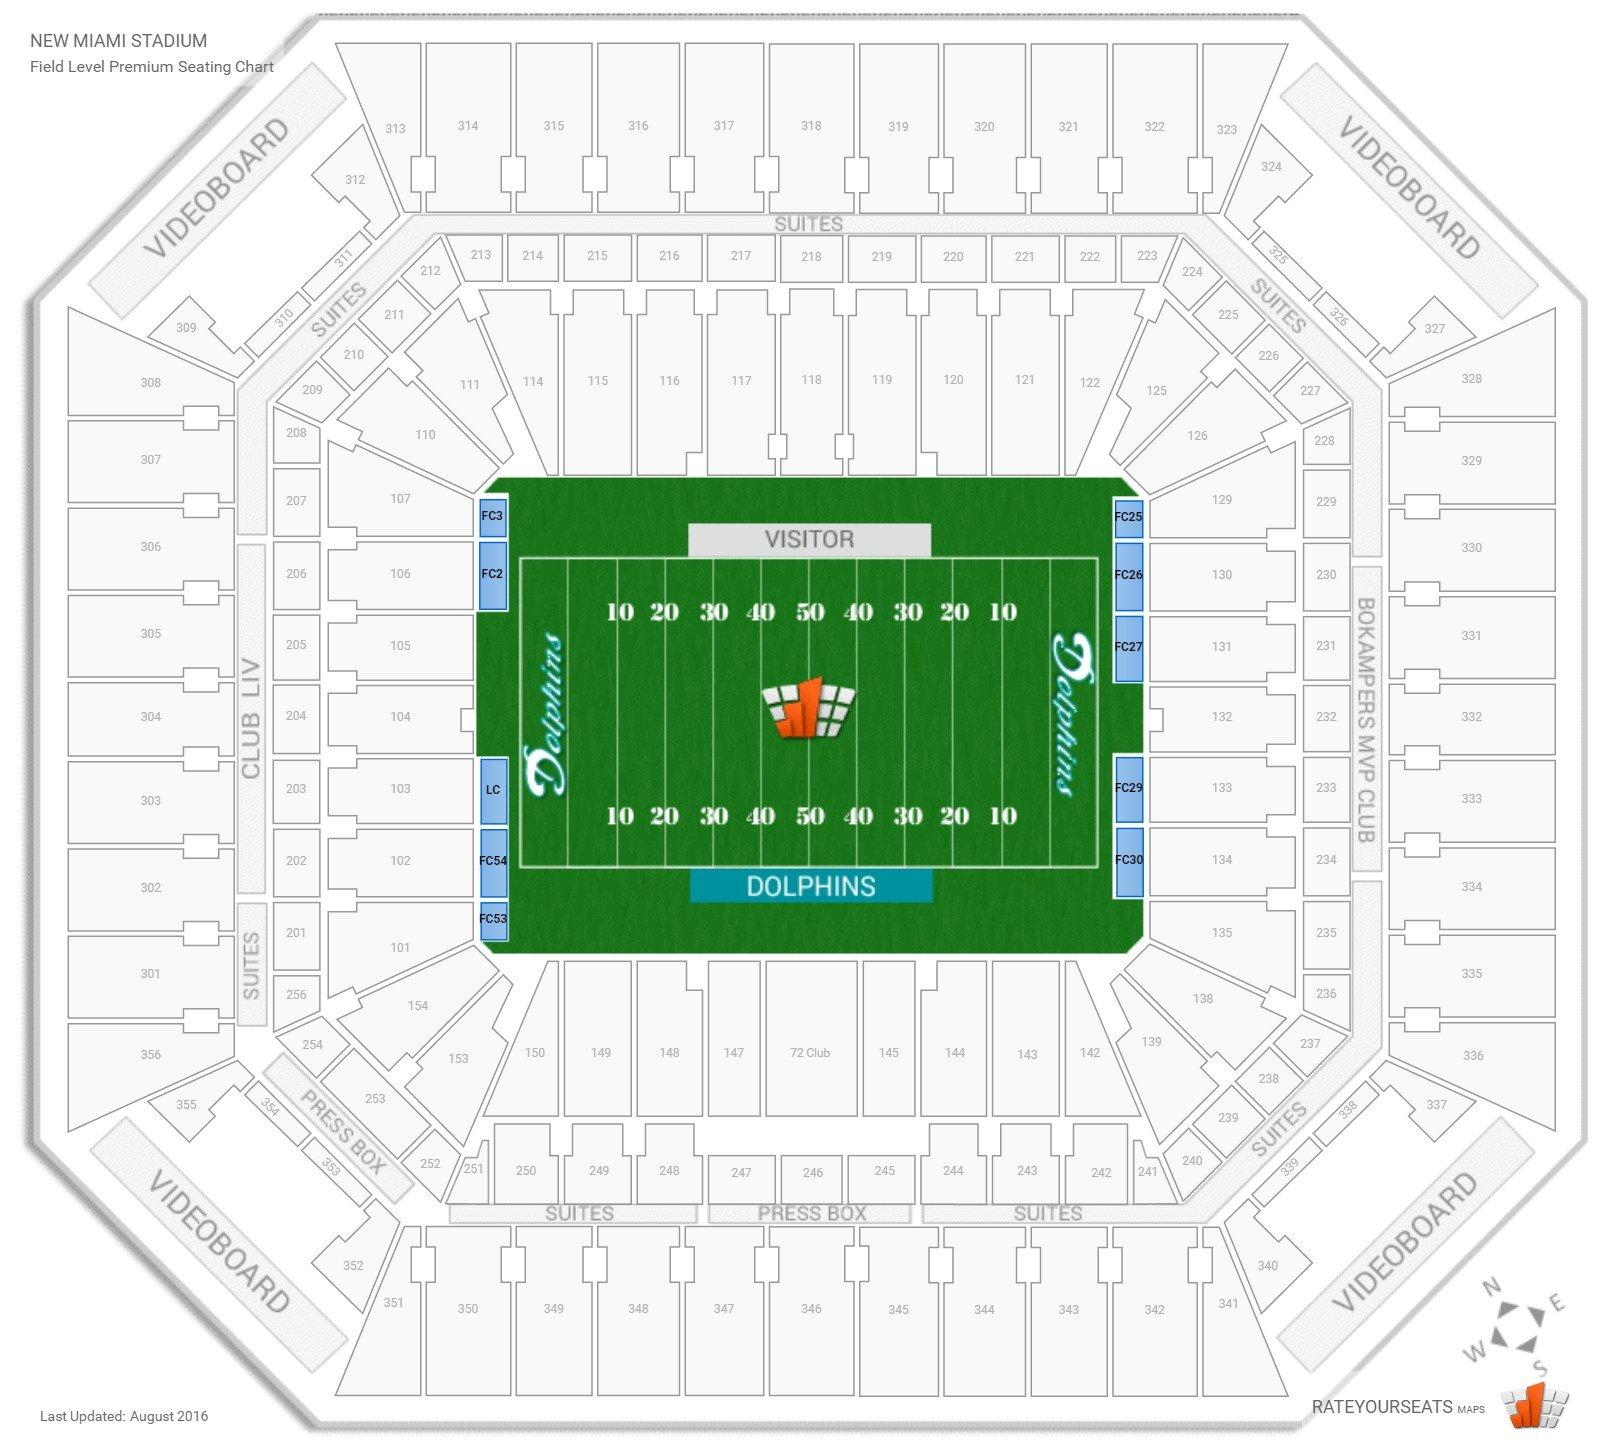 field level premium - sun life stadium football seating